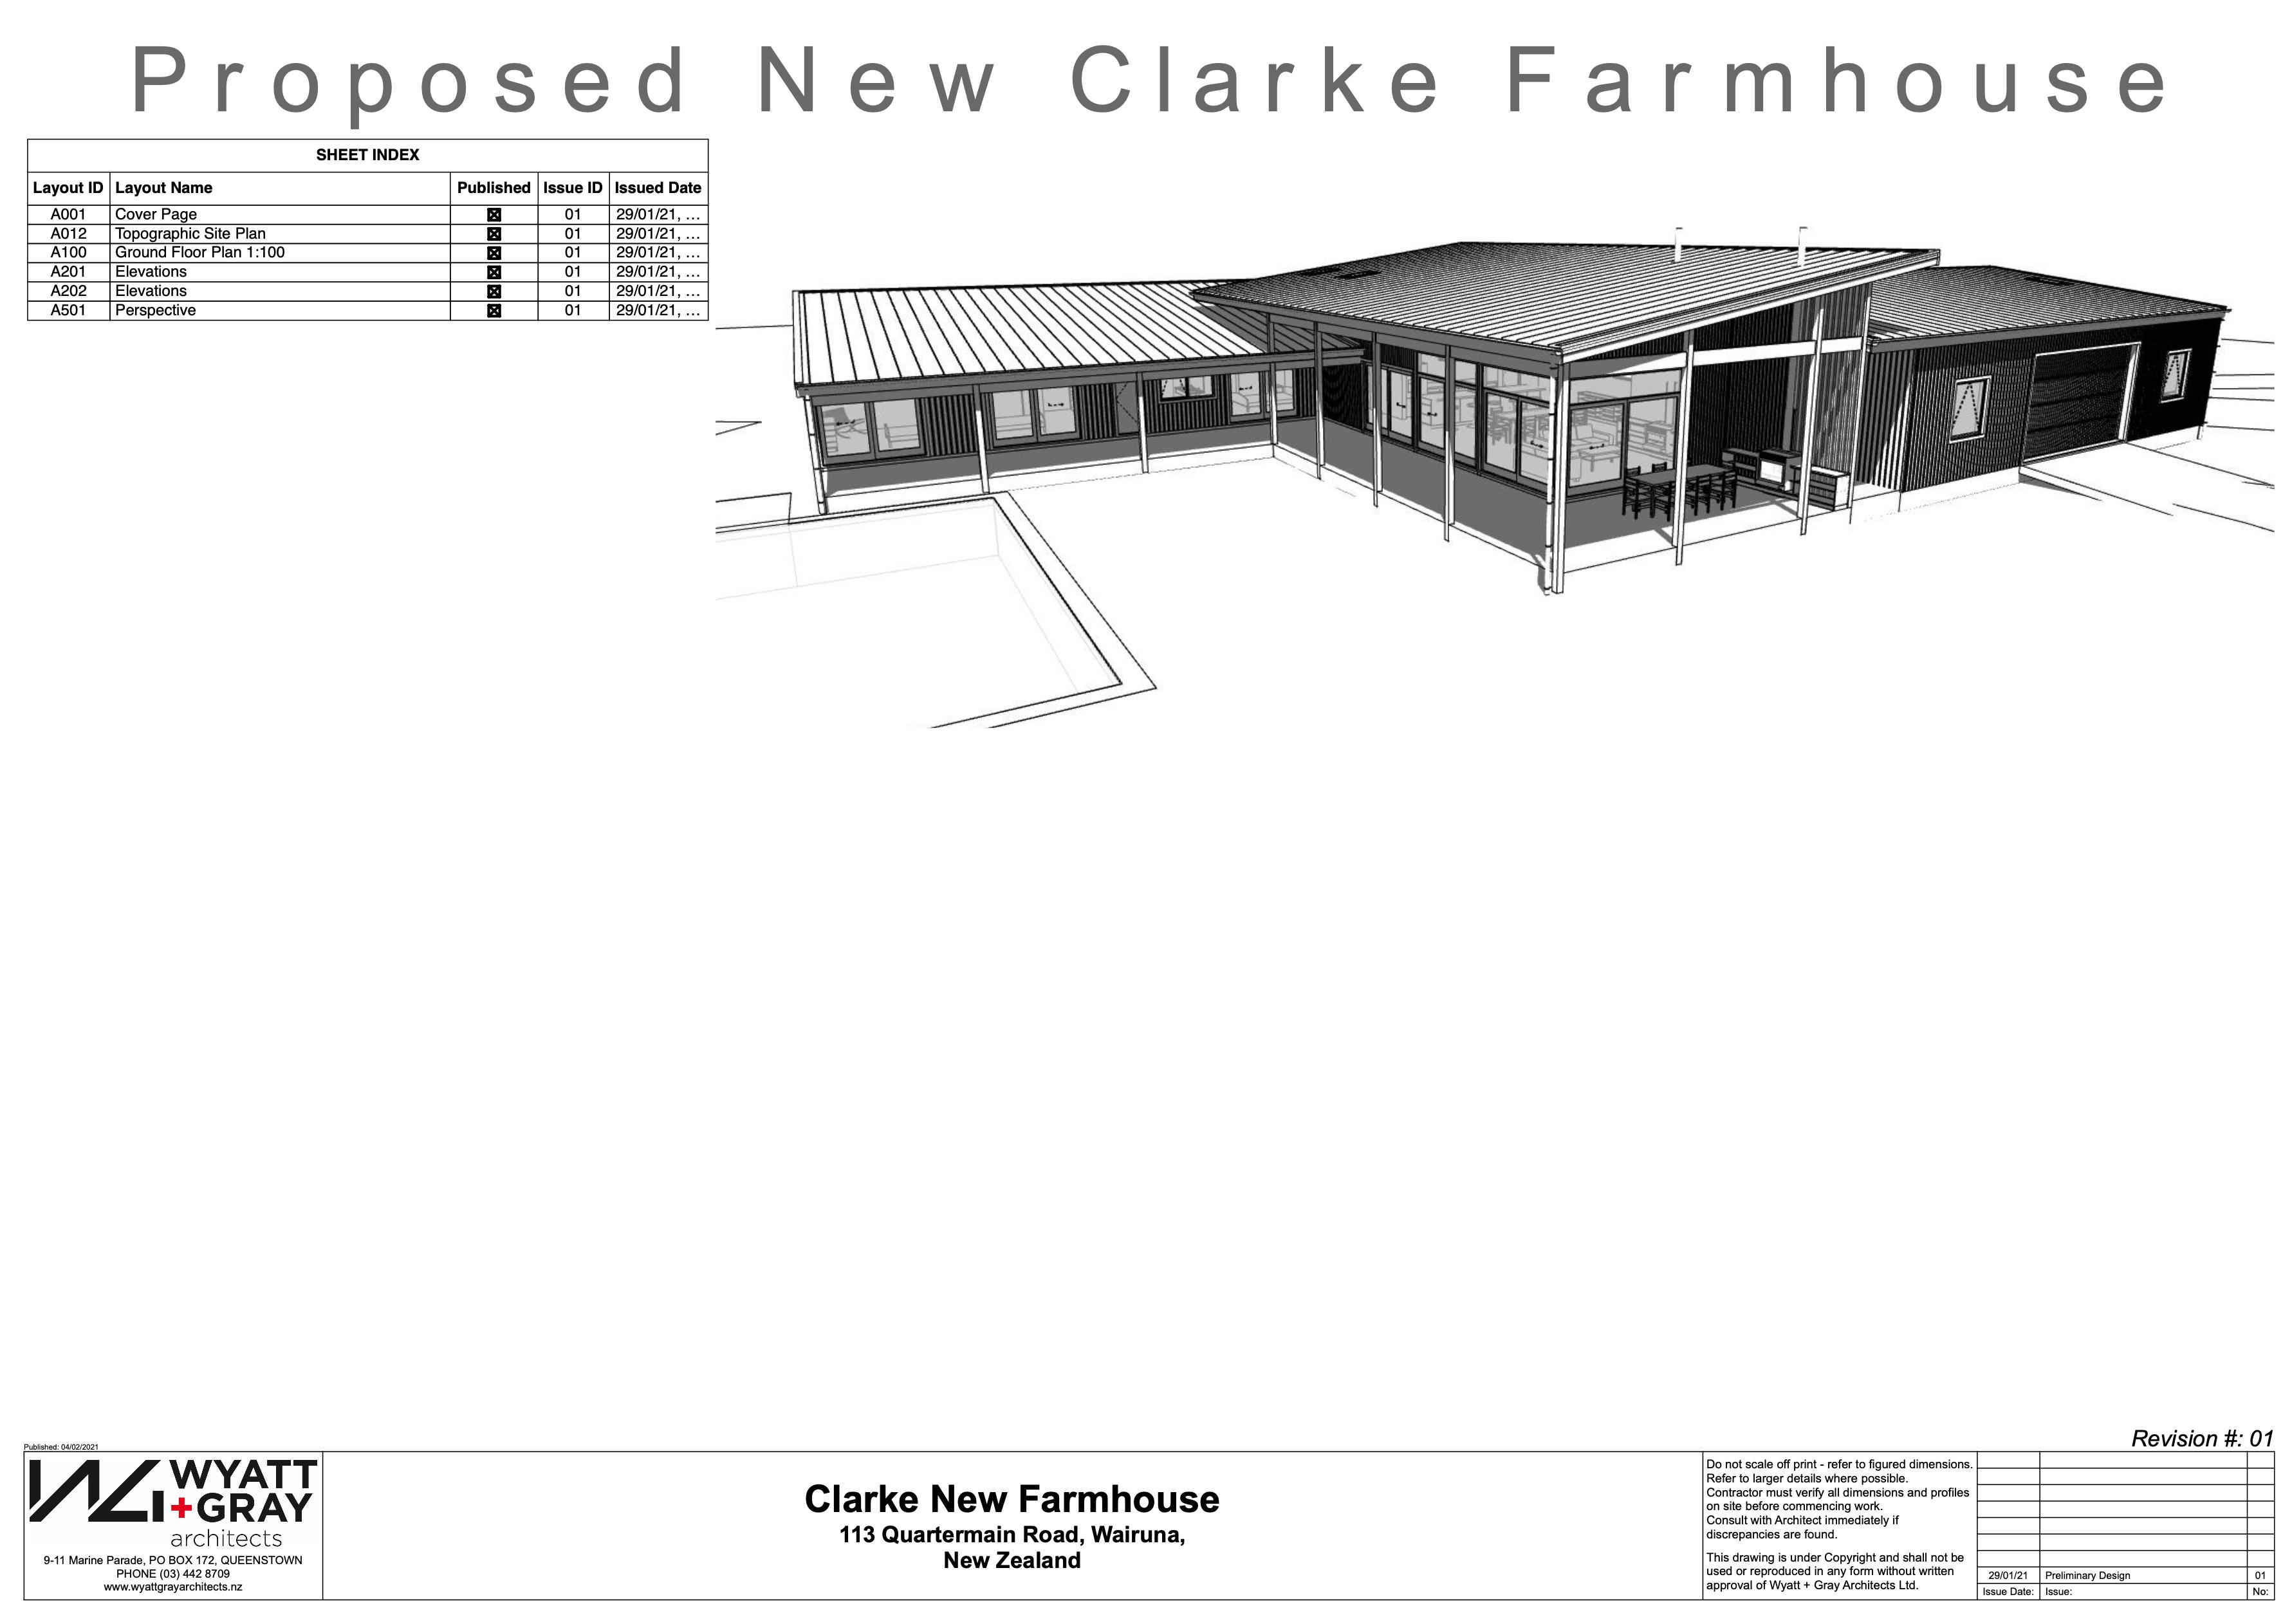 Clarke New Farmhouse